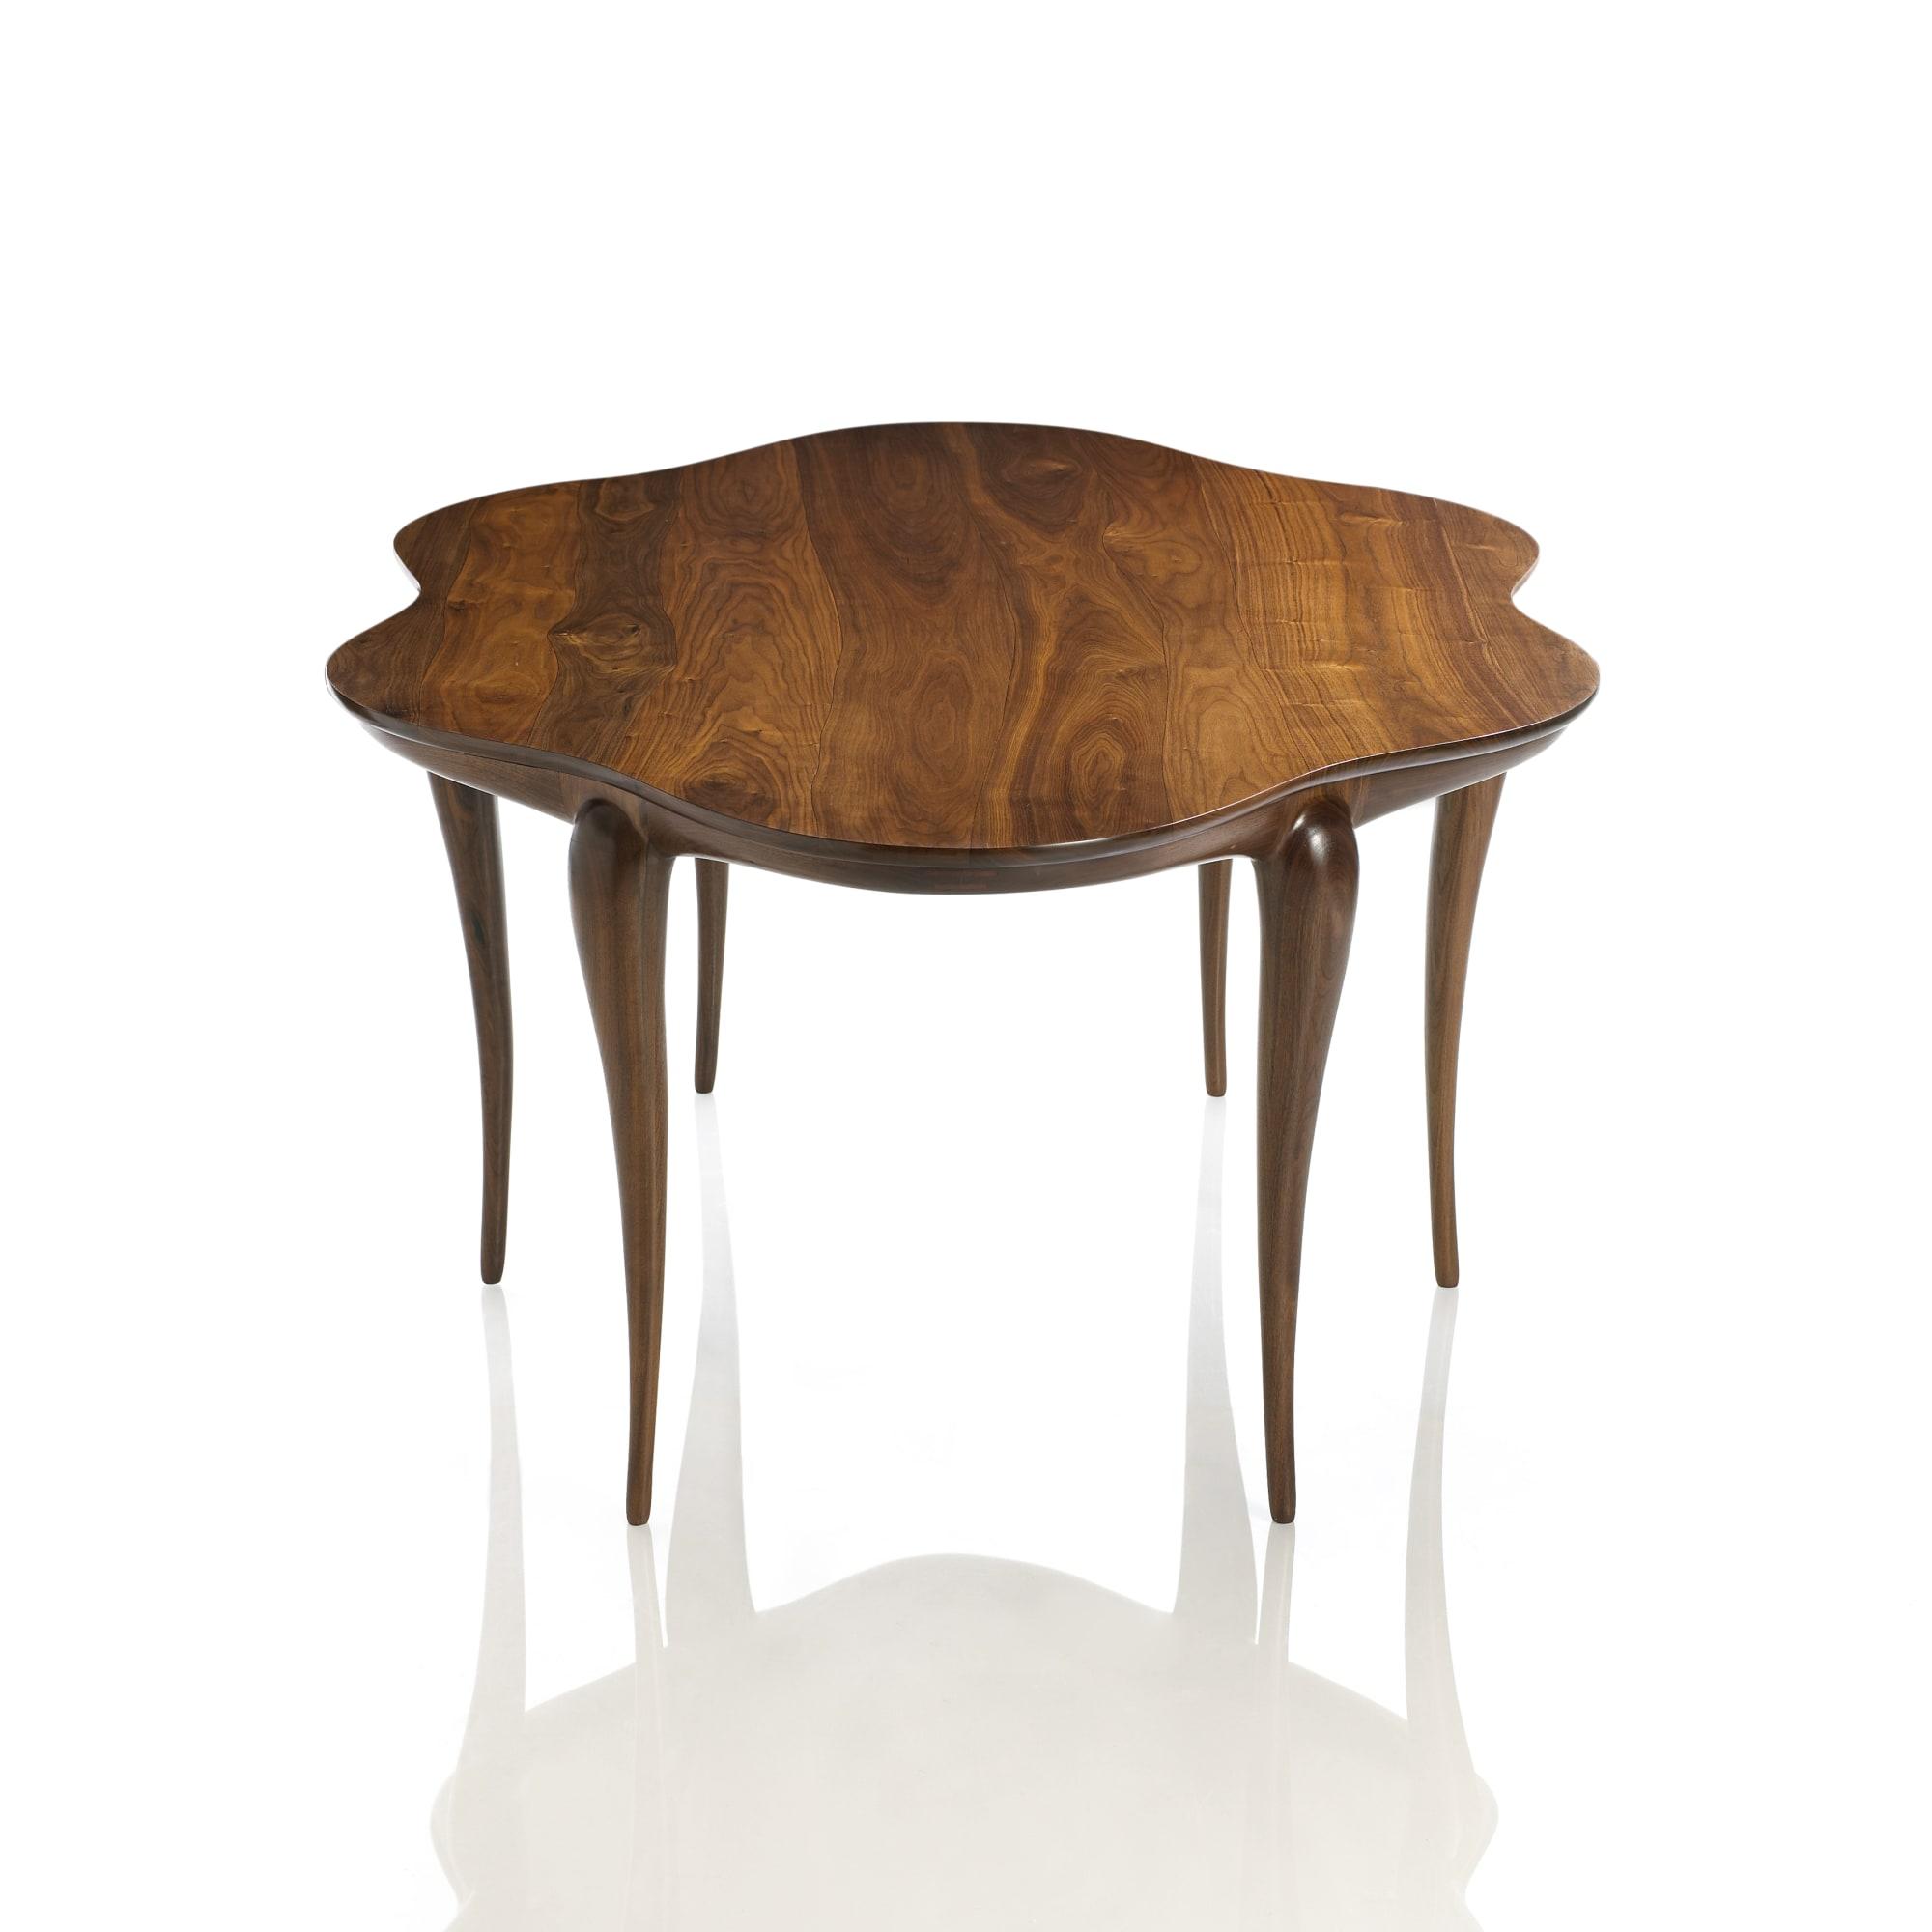 Tables by Ask Emil Skovgaard at Copenhagen, Denmark, Copenhagen - Spider